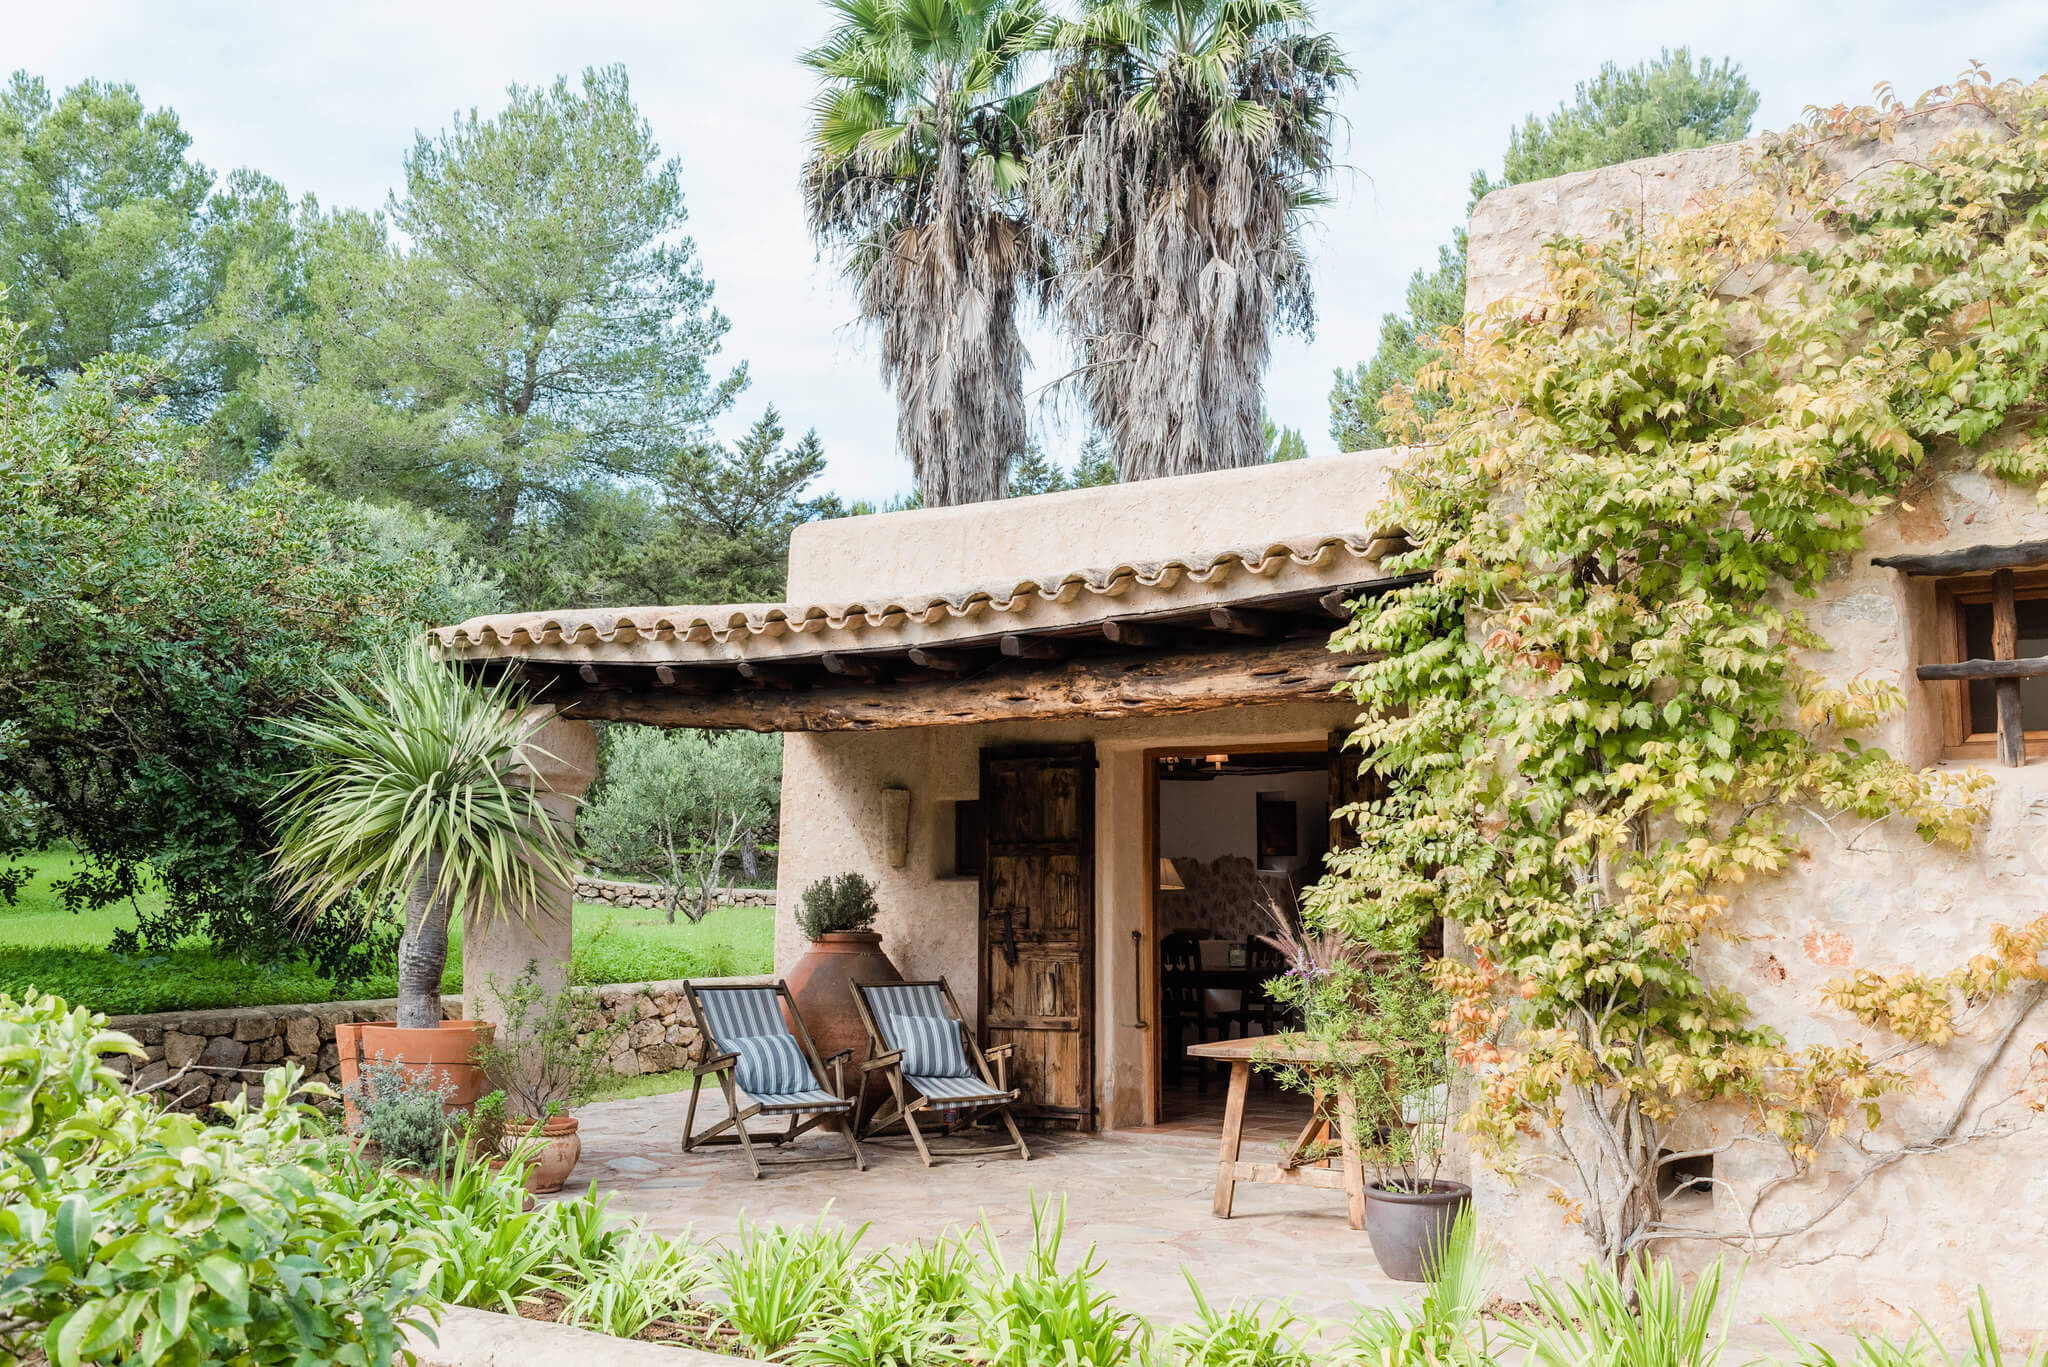 https://www.white-ibiza.com/wp-content/uploads/2020/05/white-ibiza-villas-can-sabina-exterior-terrace.jpg